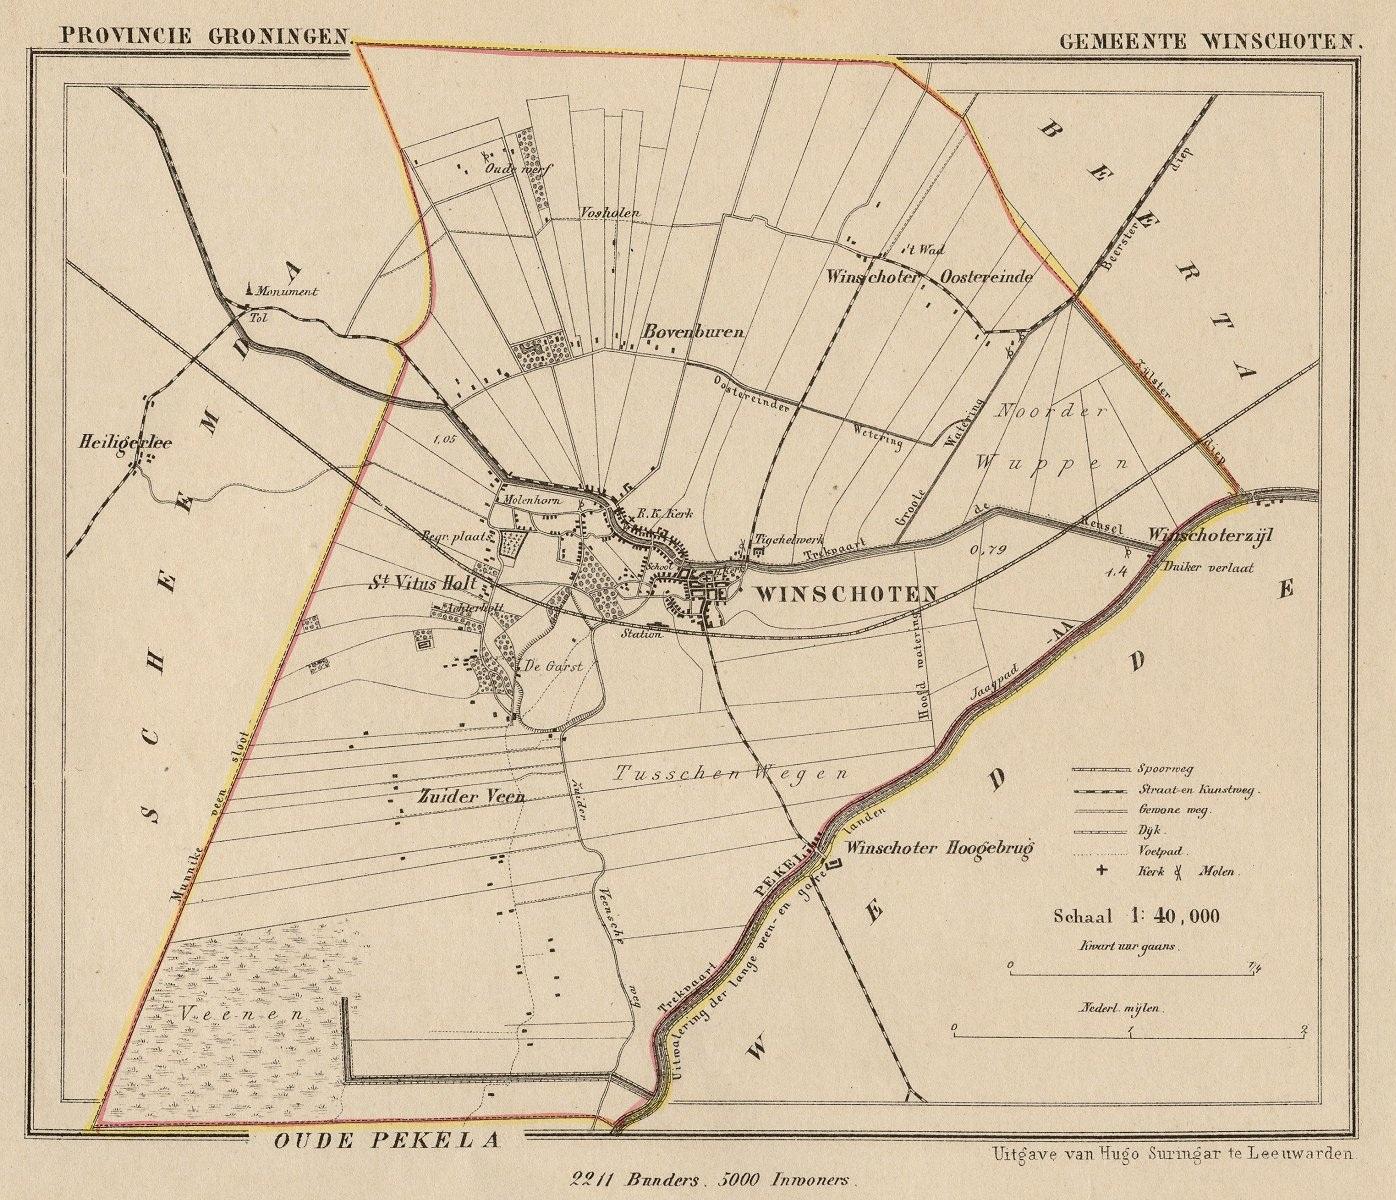 Netherlands%2C_Winschoten%2C_map%2C_around_1865-1870.jpg